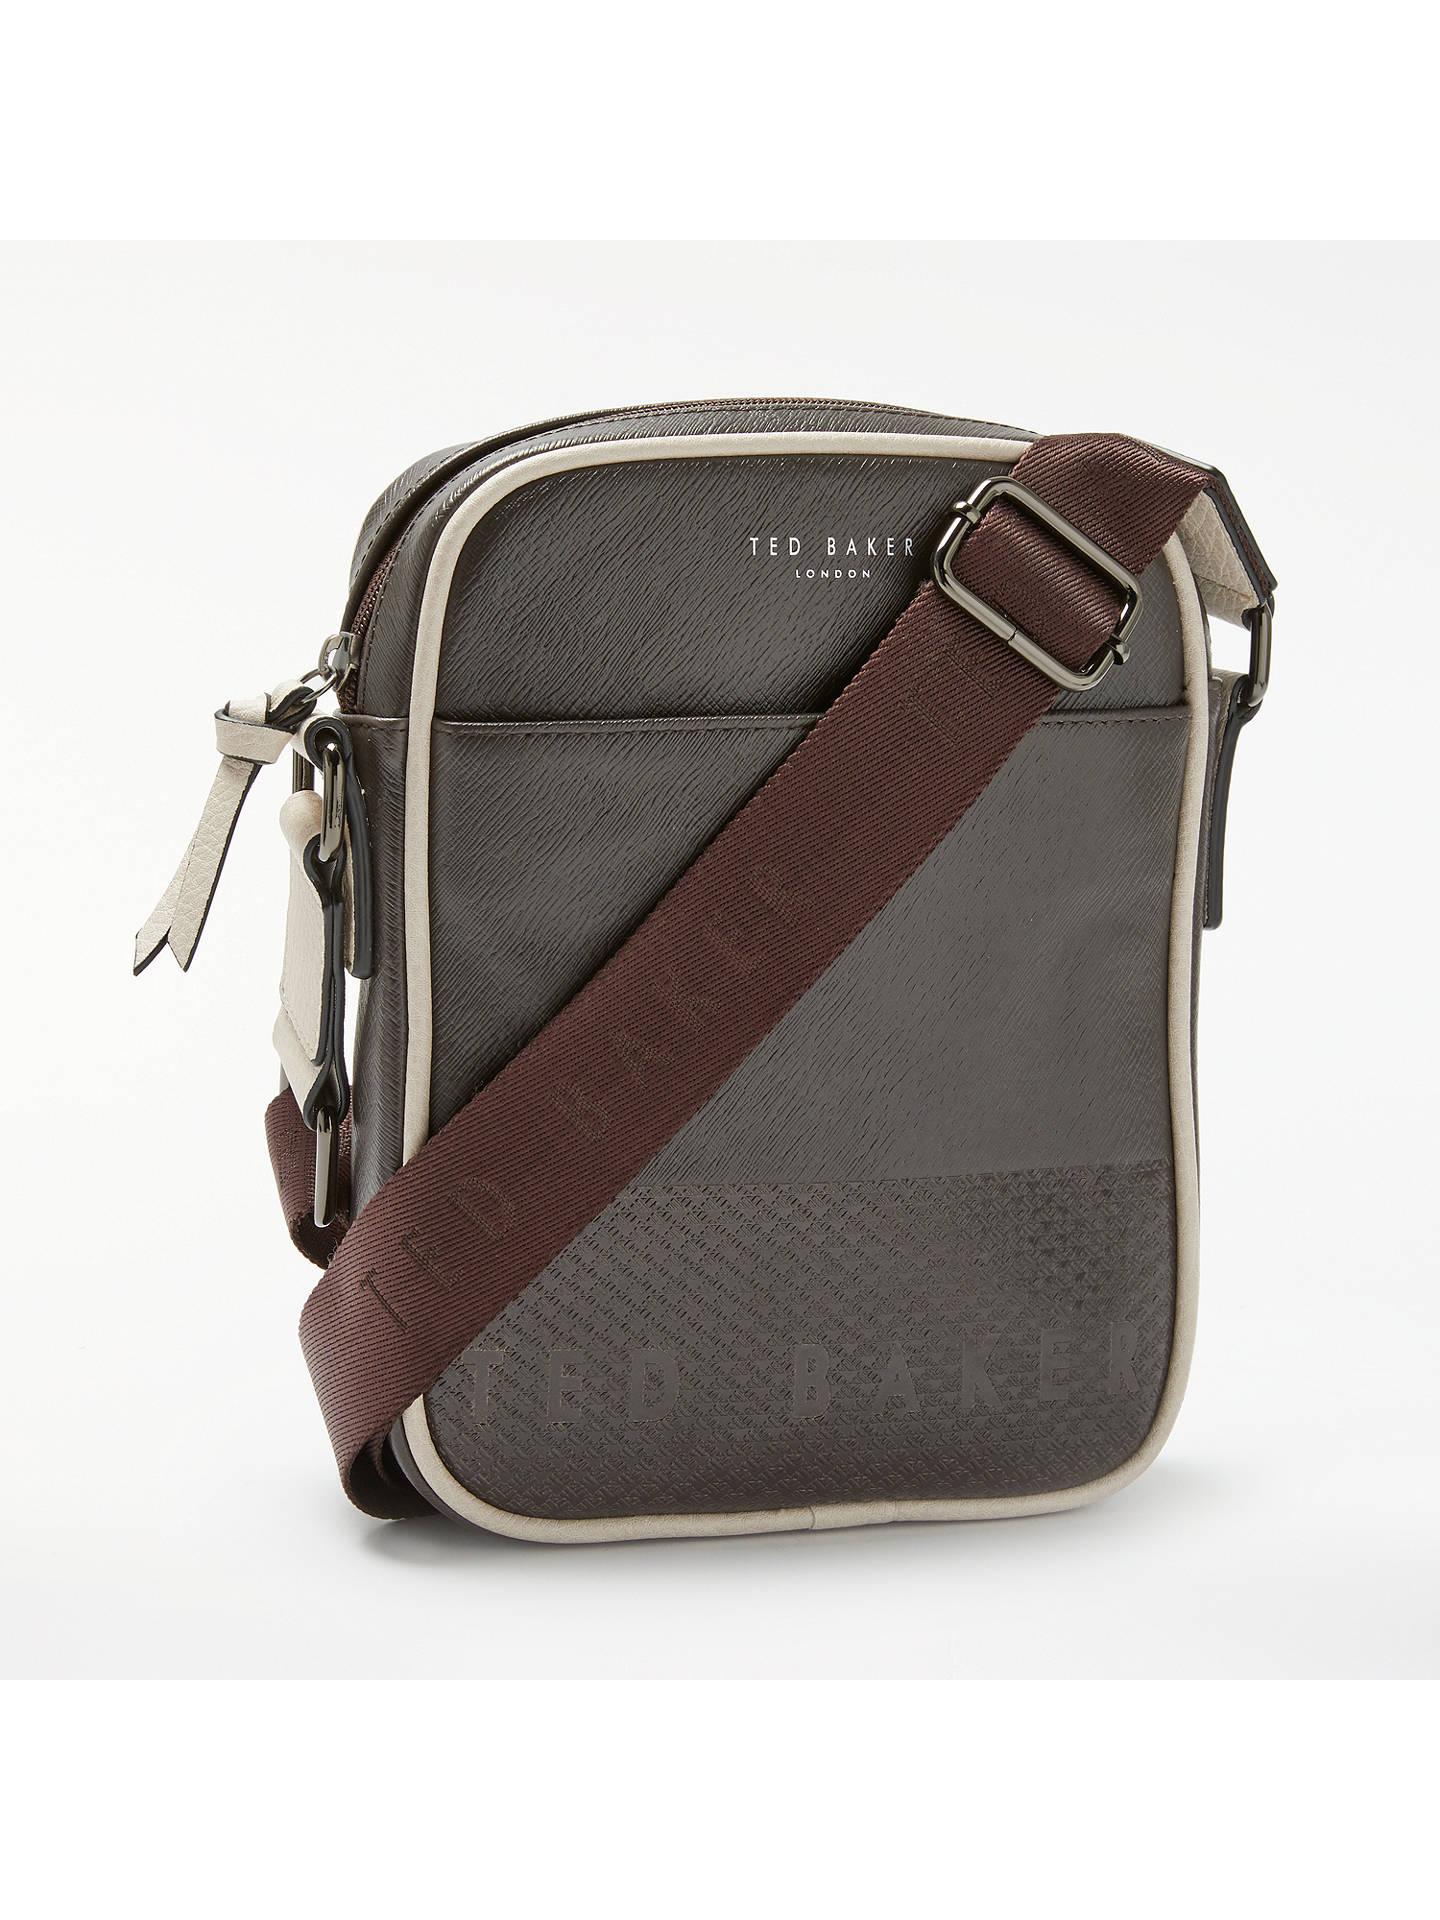 59672a2c831d Buy Ted Baker Aight Embossed Mini Flight Bag